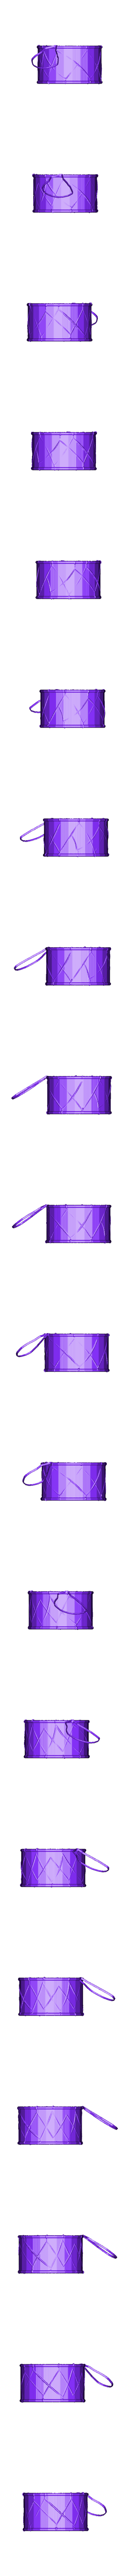 RamadanDrum.stl Download free STL file Ramadan Drum • 3D printing template, MiniFabrikam